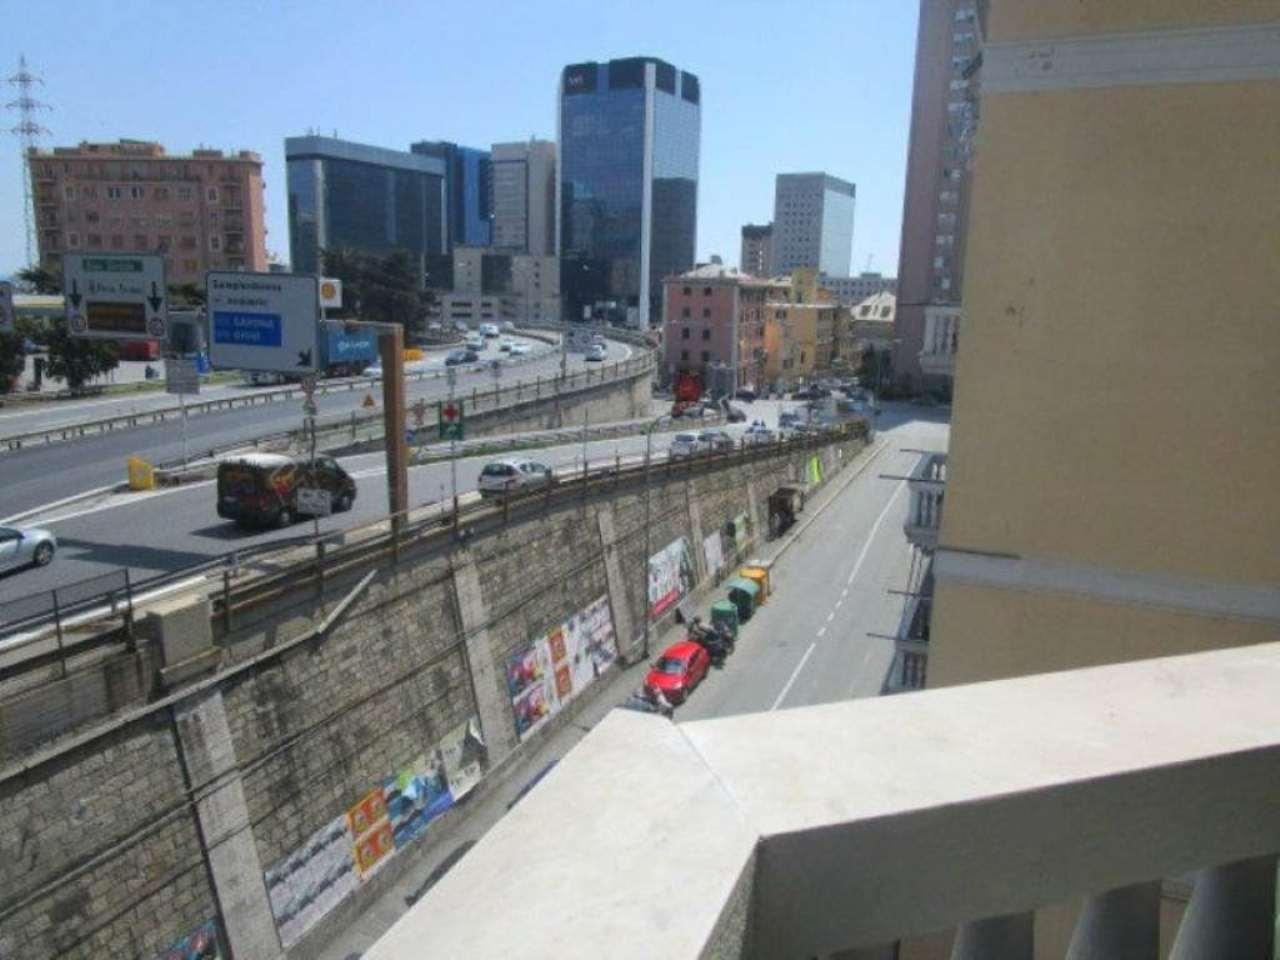 Bilocale Genova Via San Bartolomeo Del Fossato 11